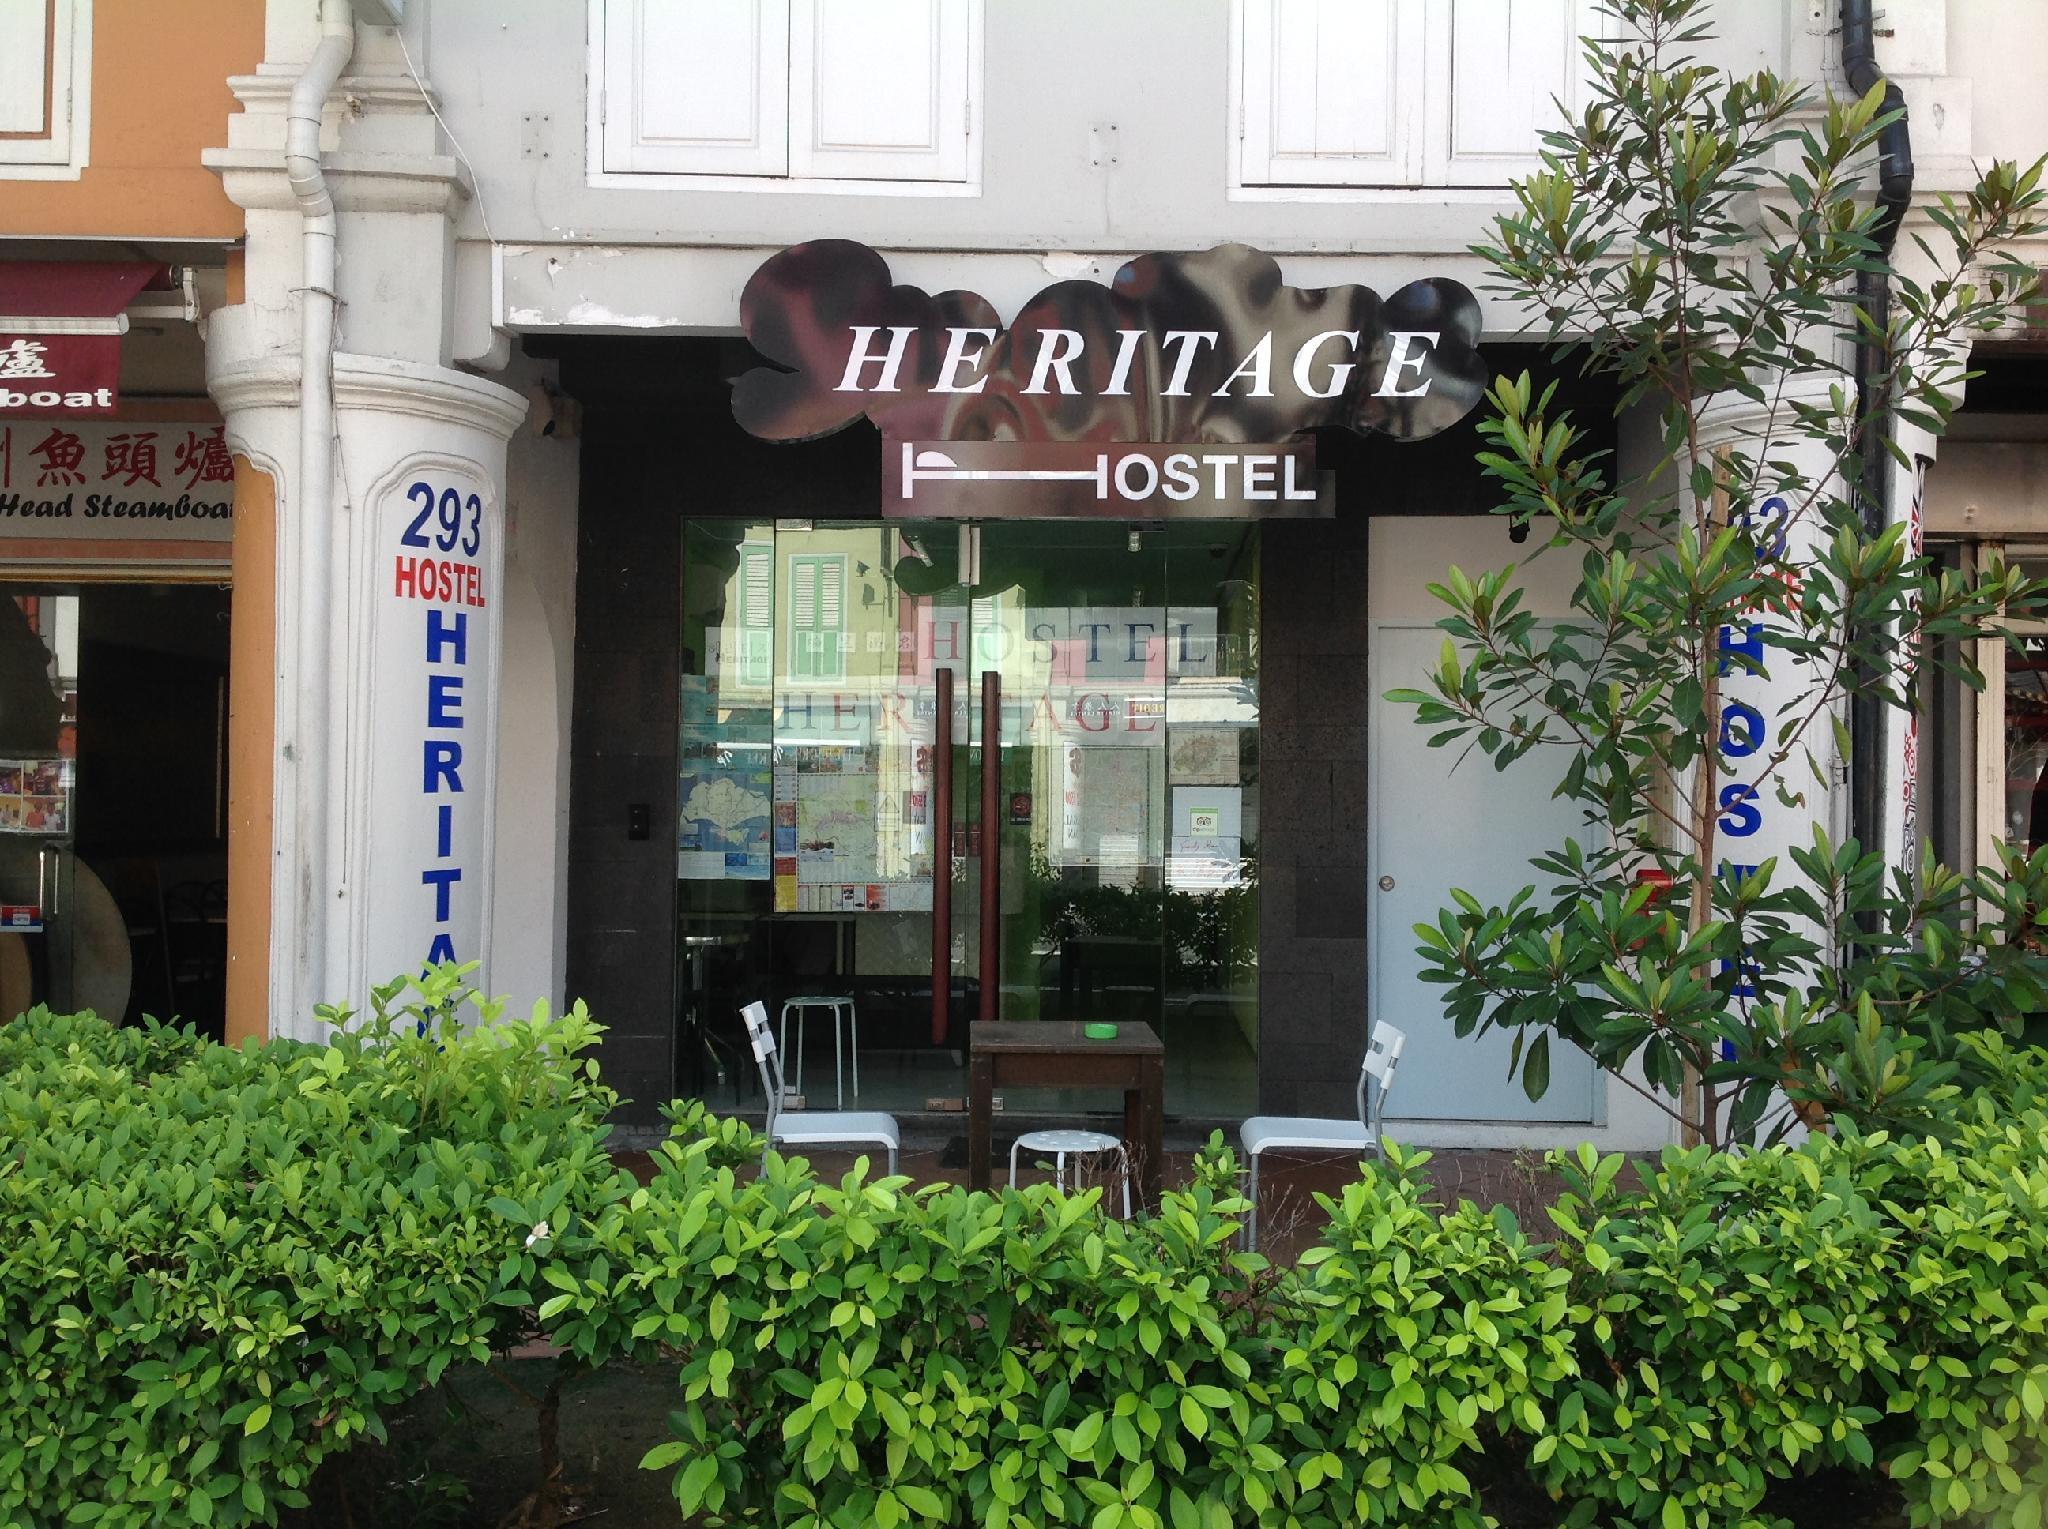 Heritage Hostel, Outram